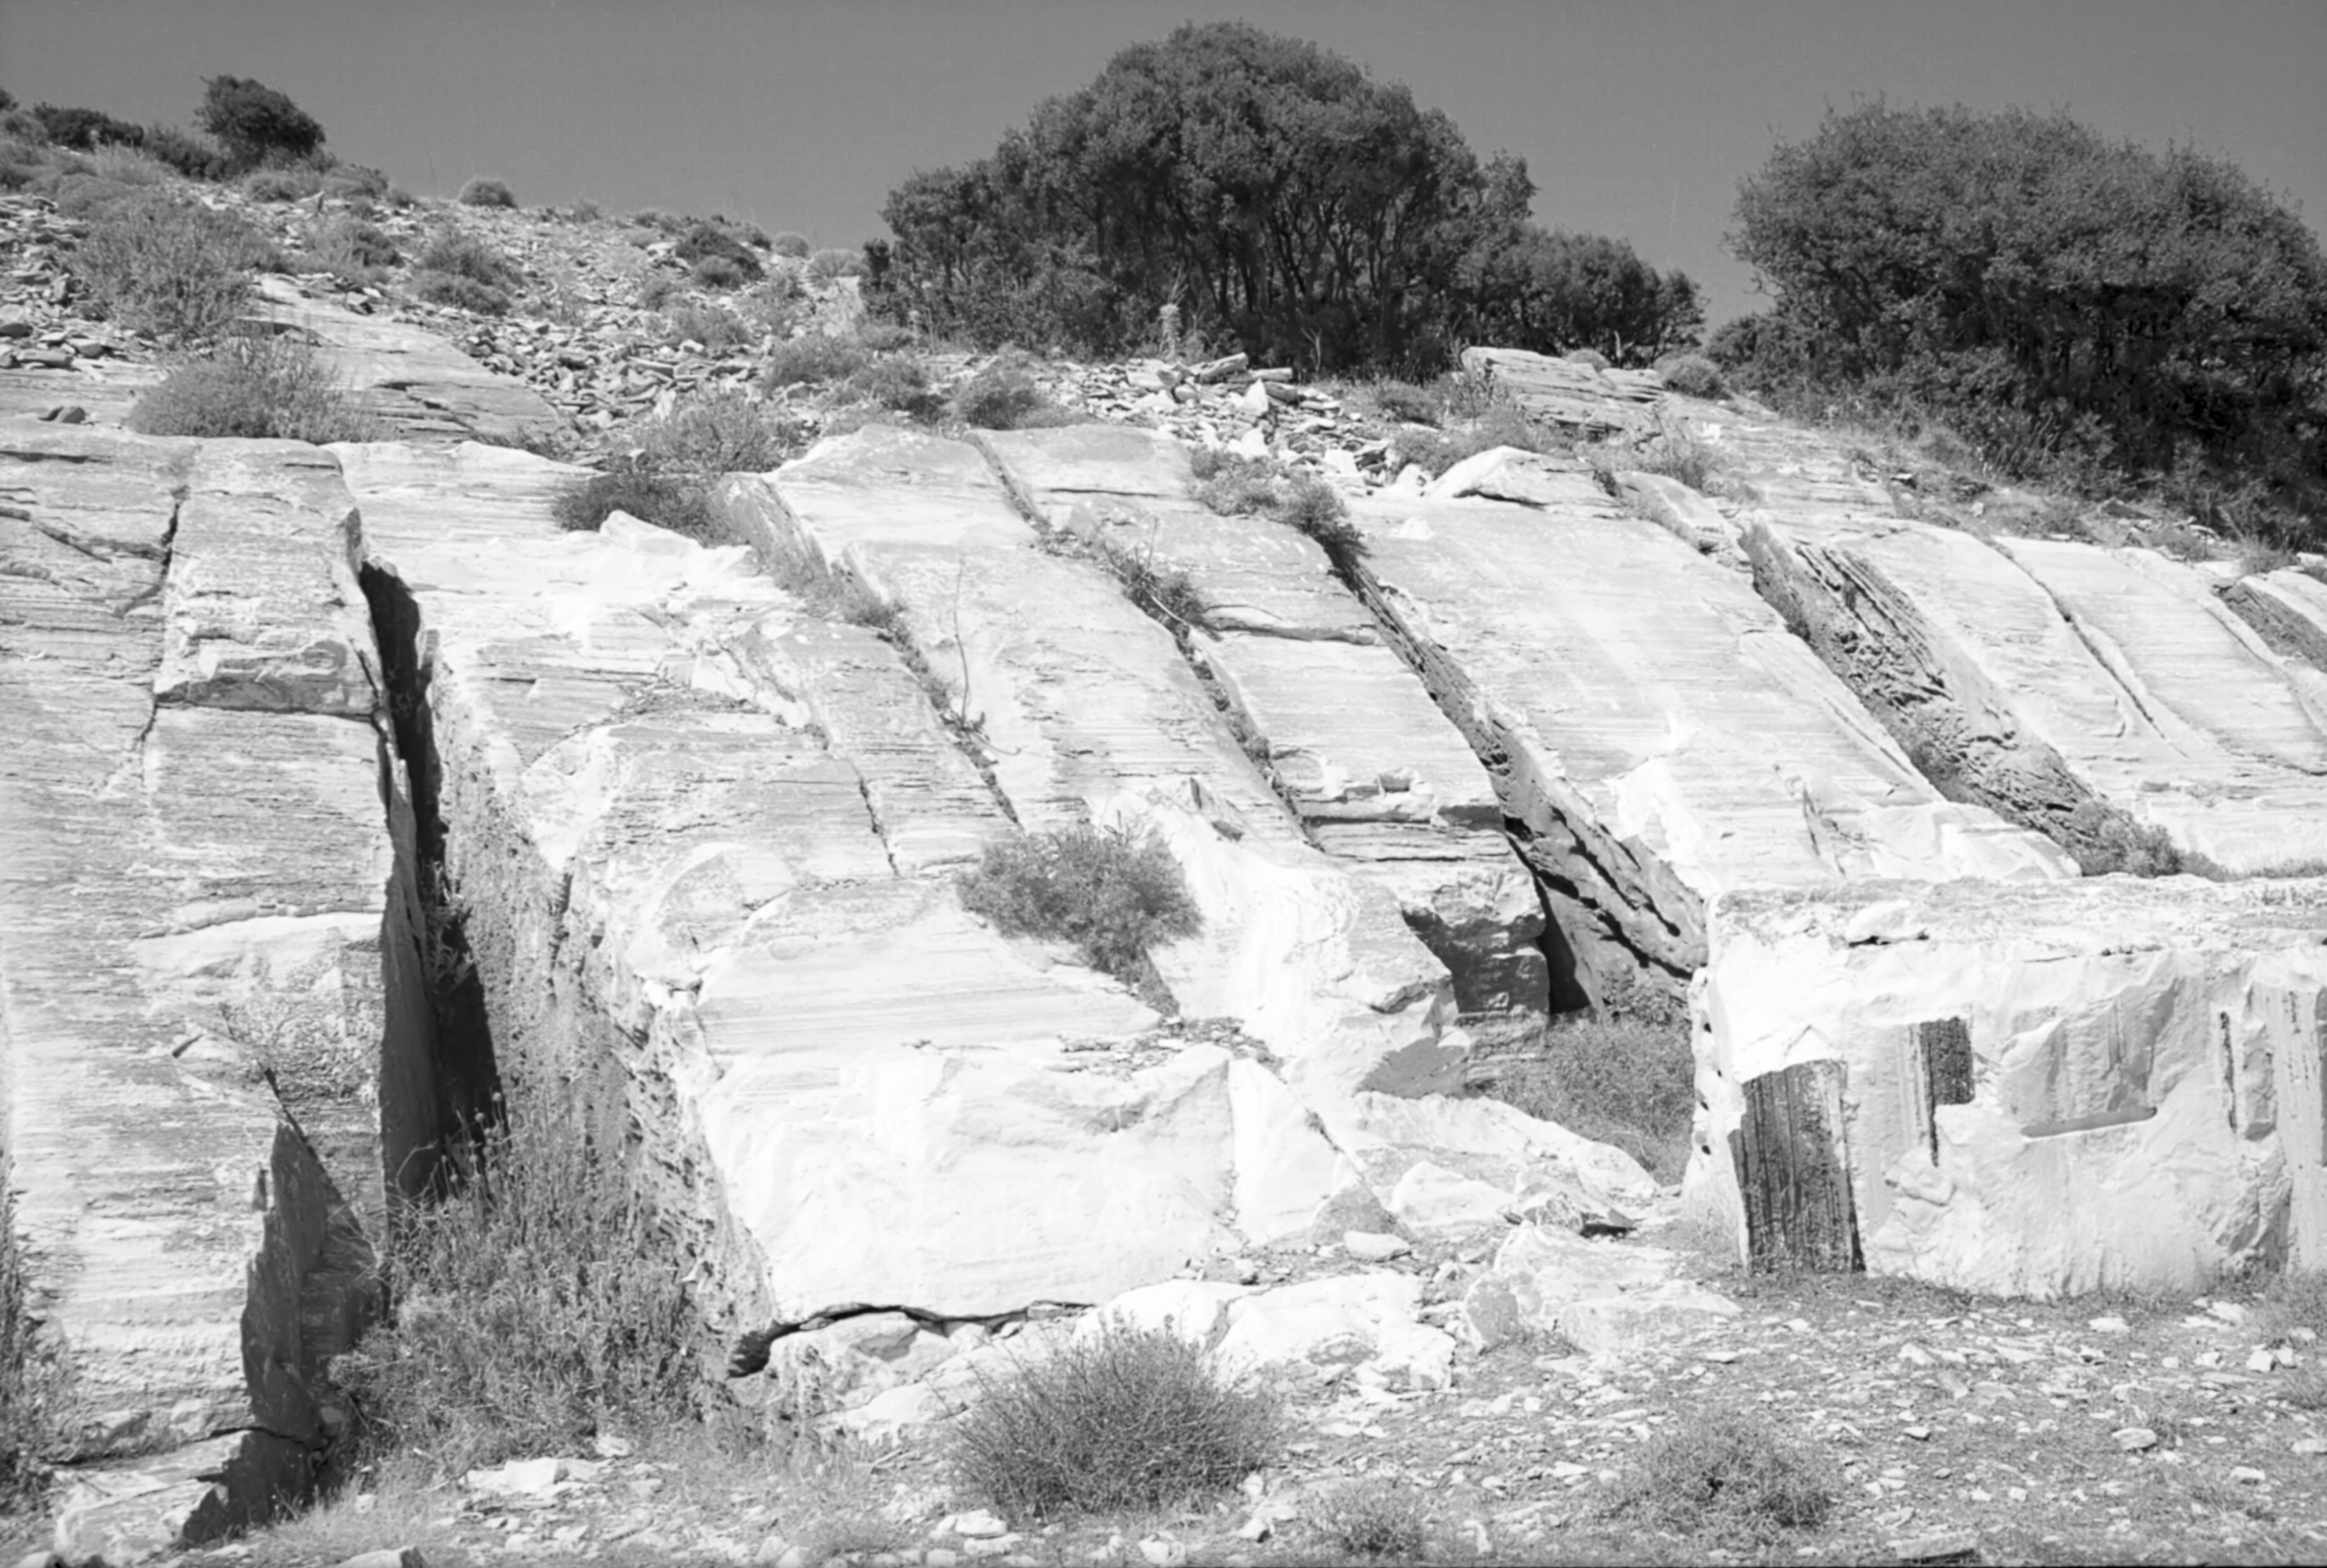 Malý mramorový lom u Apeiranthu. Kredit: Zde, Wikimedia Commons. Licence CC 4.0.